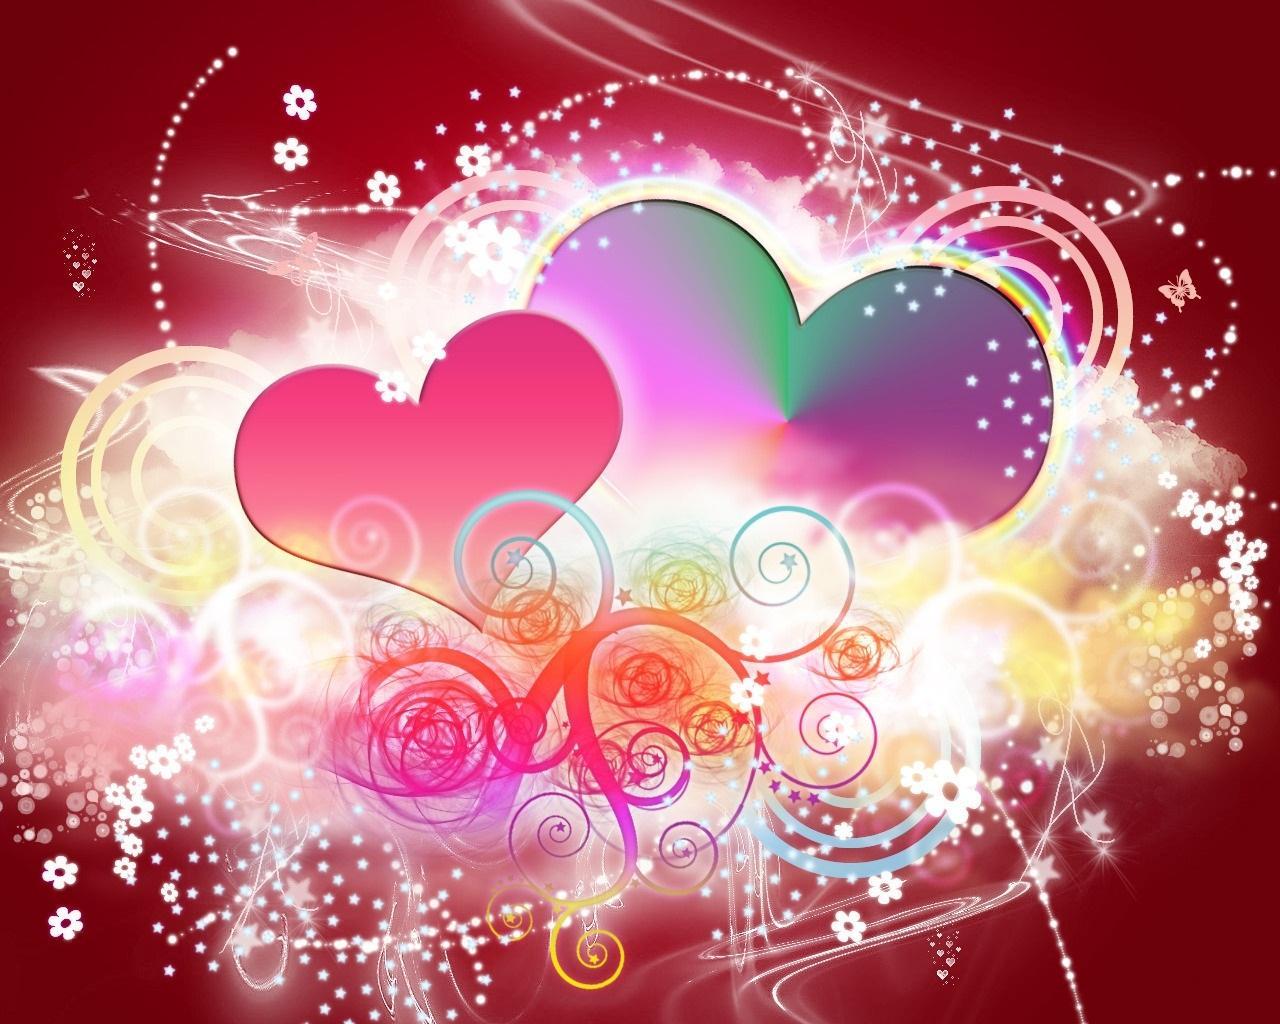 day wallpaper romantic valentine s day wallpaper cane valentine s day 1280x1024